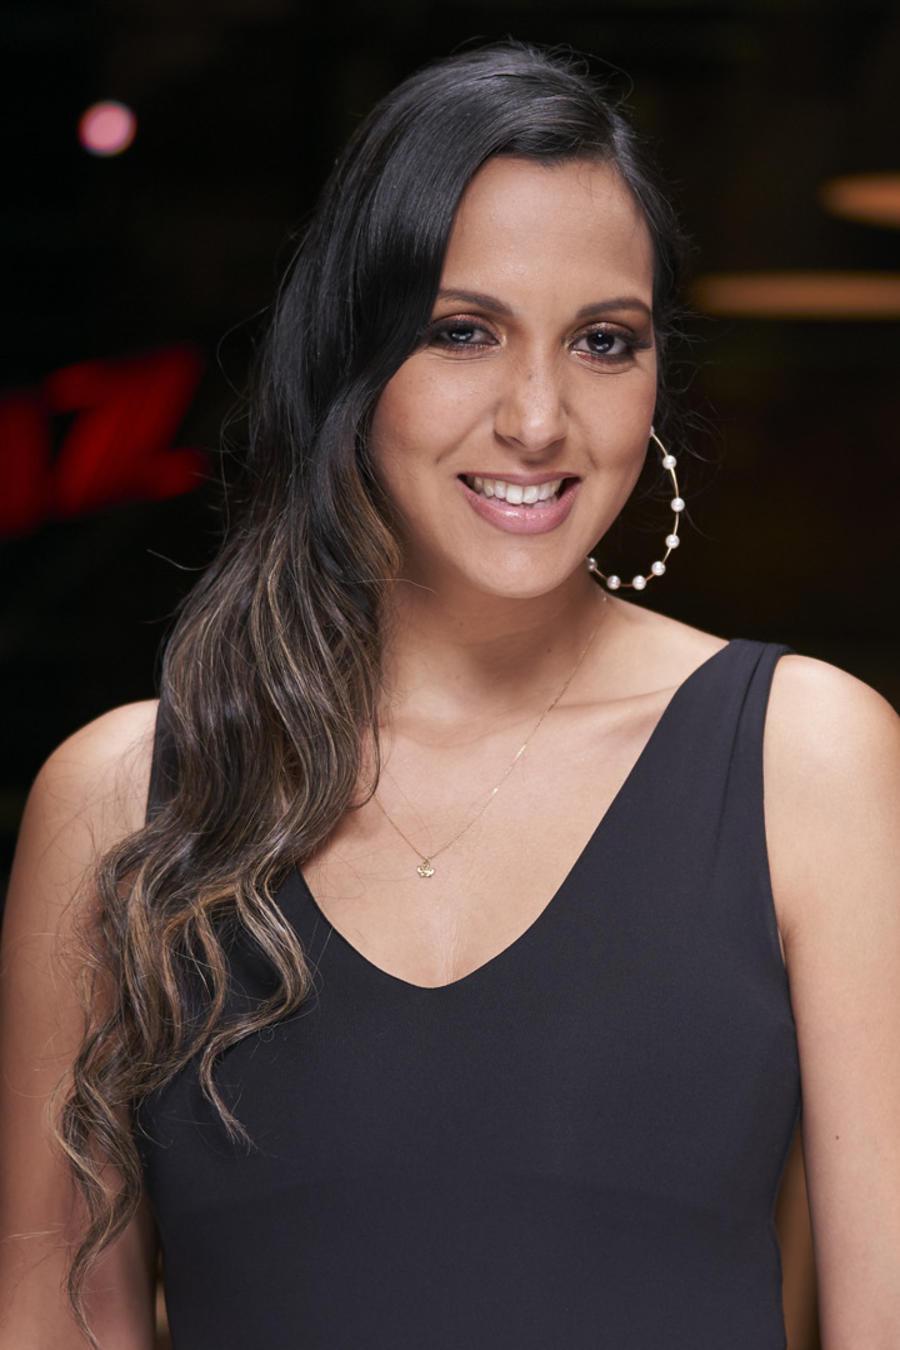 Christine Marcelle, participante del Team Wisin en La Voz US 2